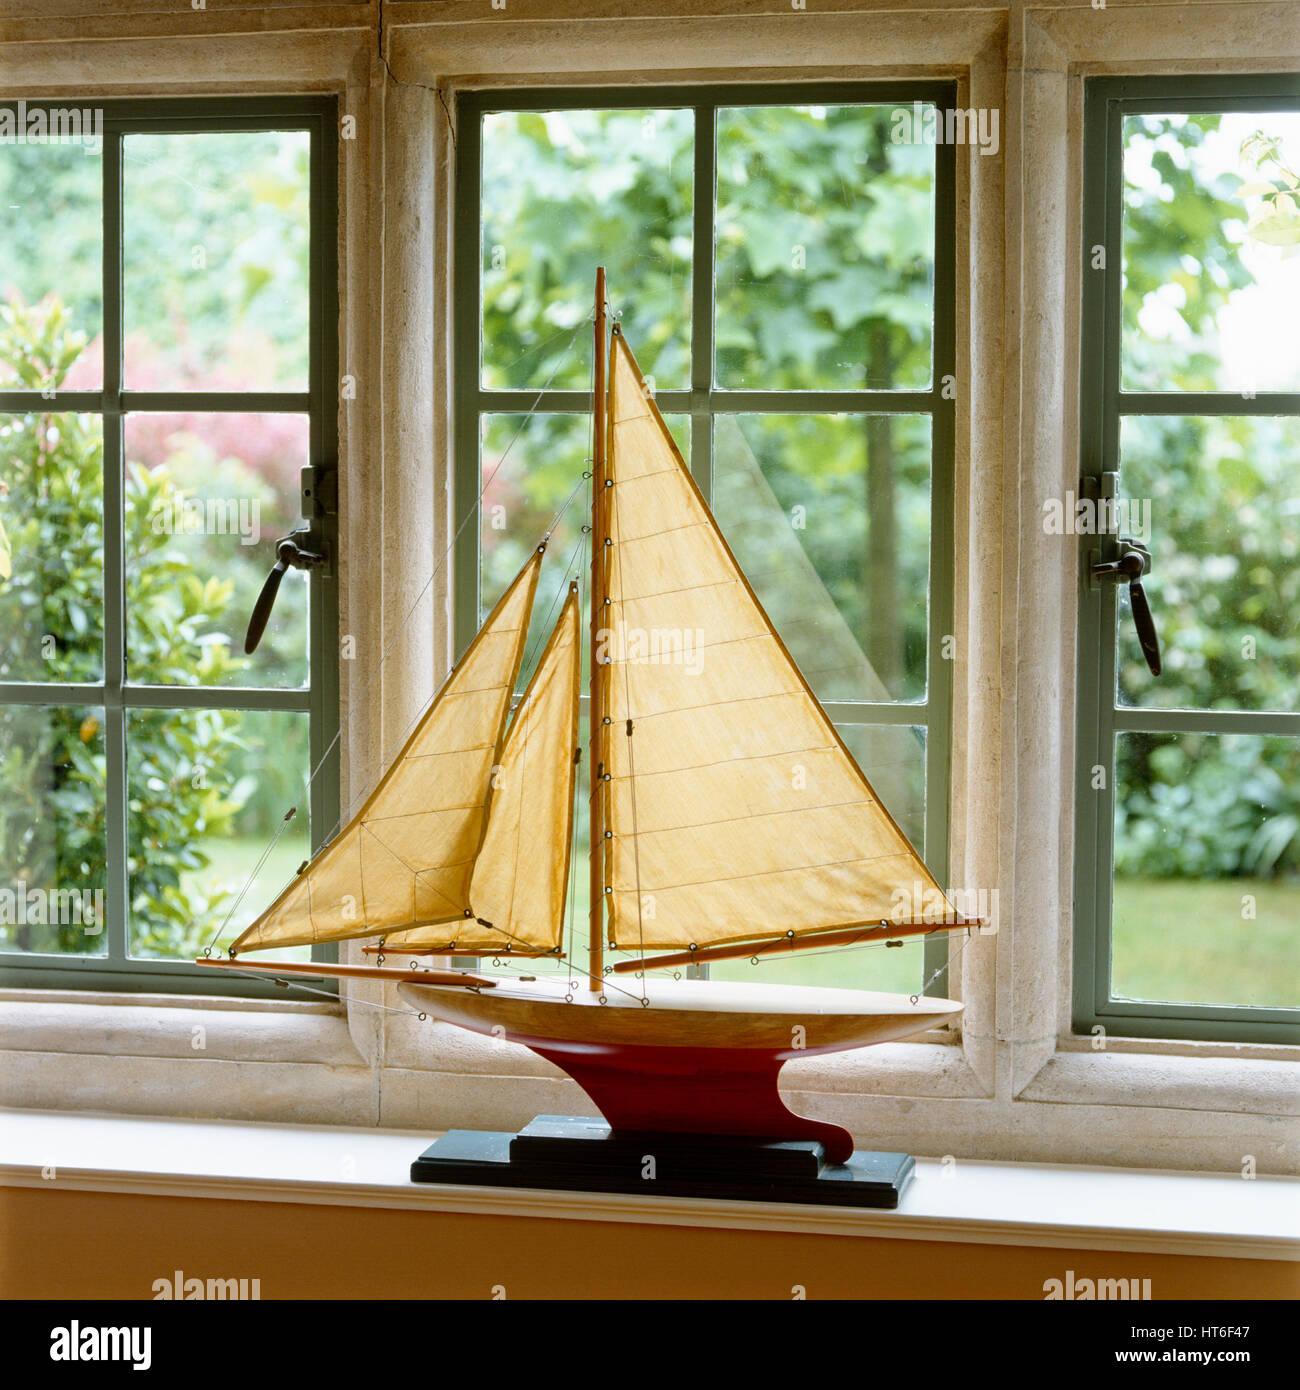 Model sailboat on windowsill. Stock Photo